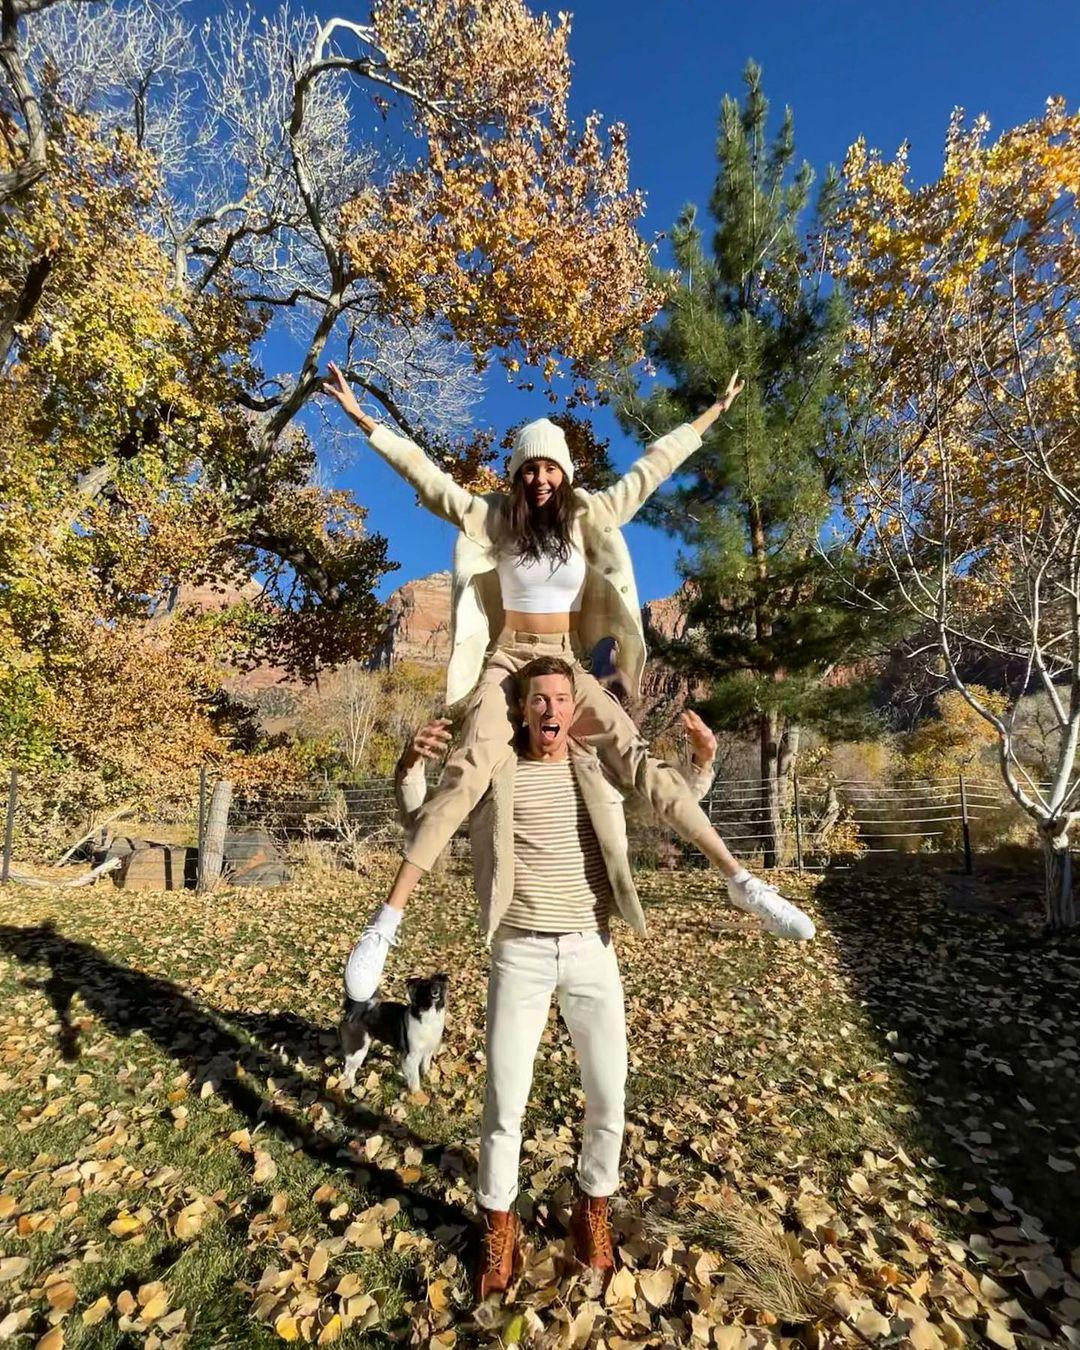 Nina Dobrev Balances on BF Shaun White's Shoulders in Perfect Fall Pic